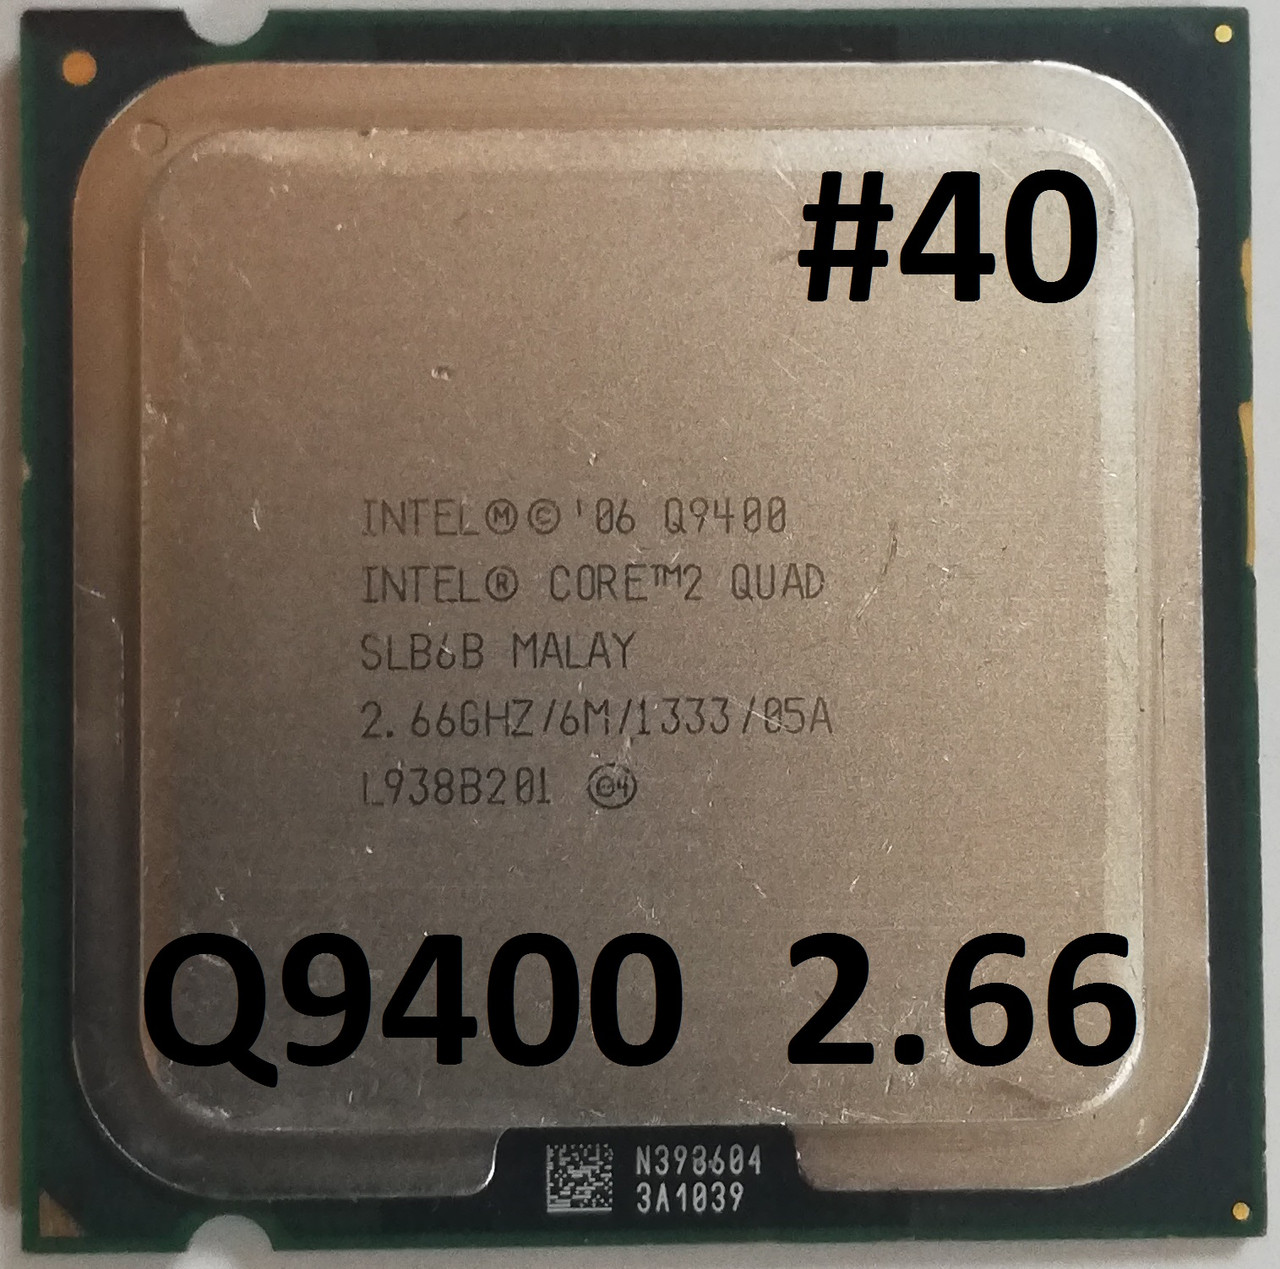 Процессор  ЛОТ #40 Intel® Core™2 Quad Q9400 R0 SLB6B 2.66GHz 6M Cache 1333 MHz FSB Soket 775 Б/У